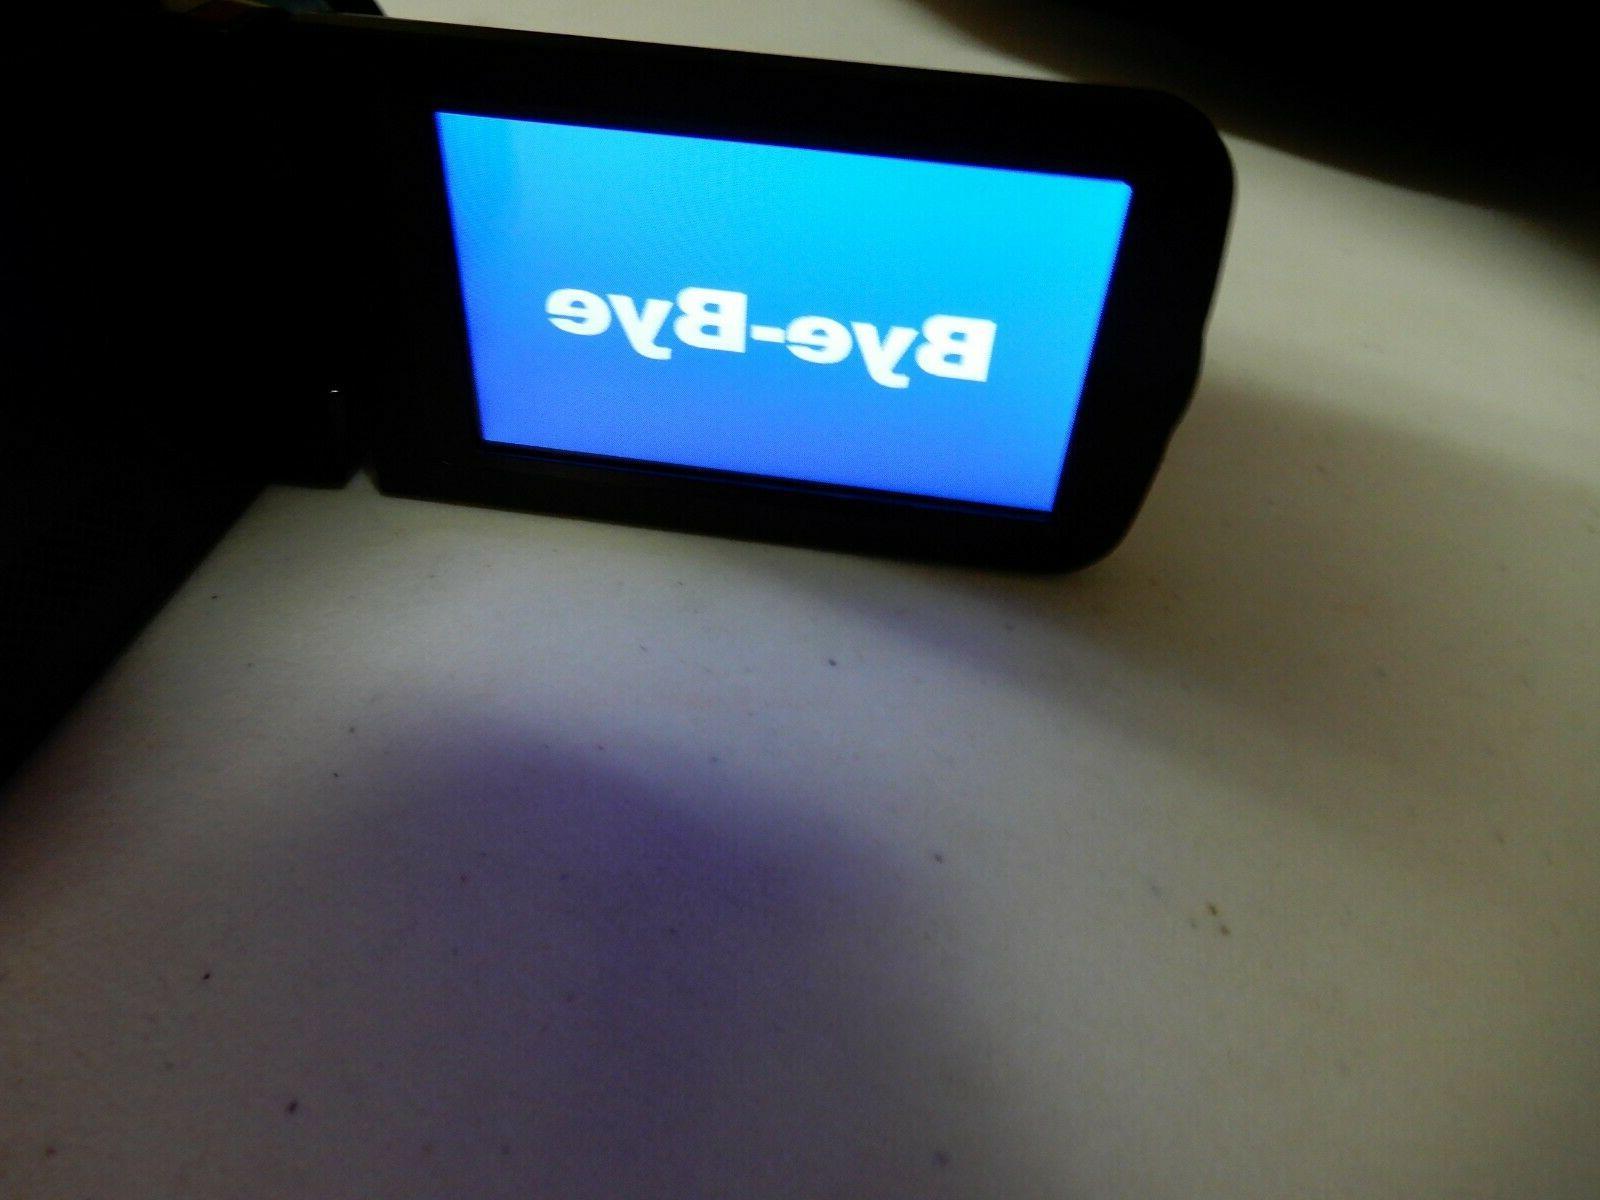 Besteker HD HDV 301STR 24MP 1920X1080 with Microphone